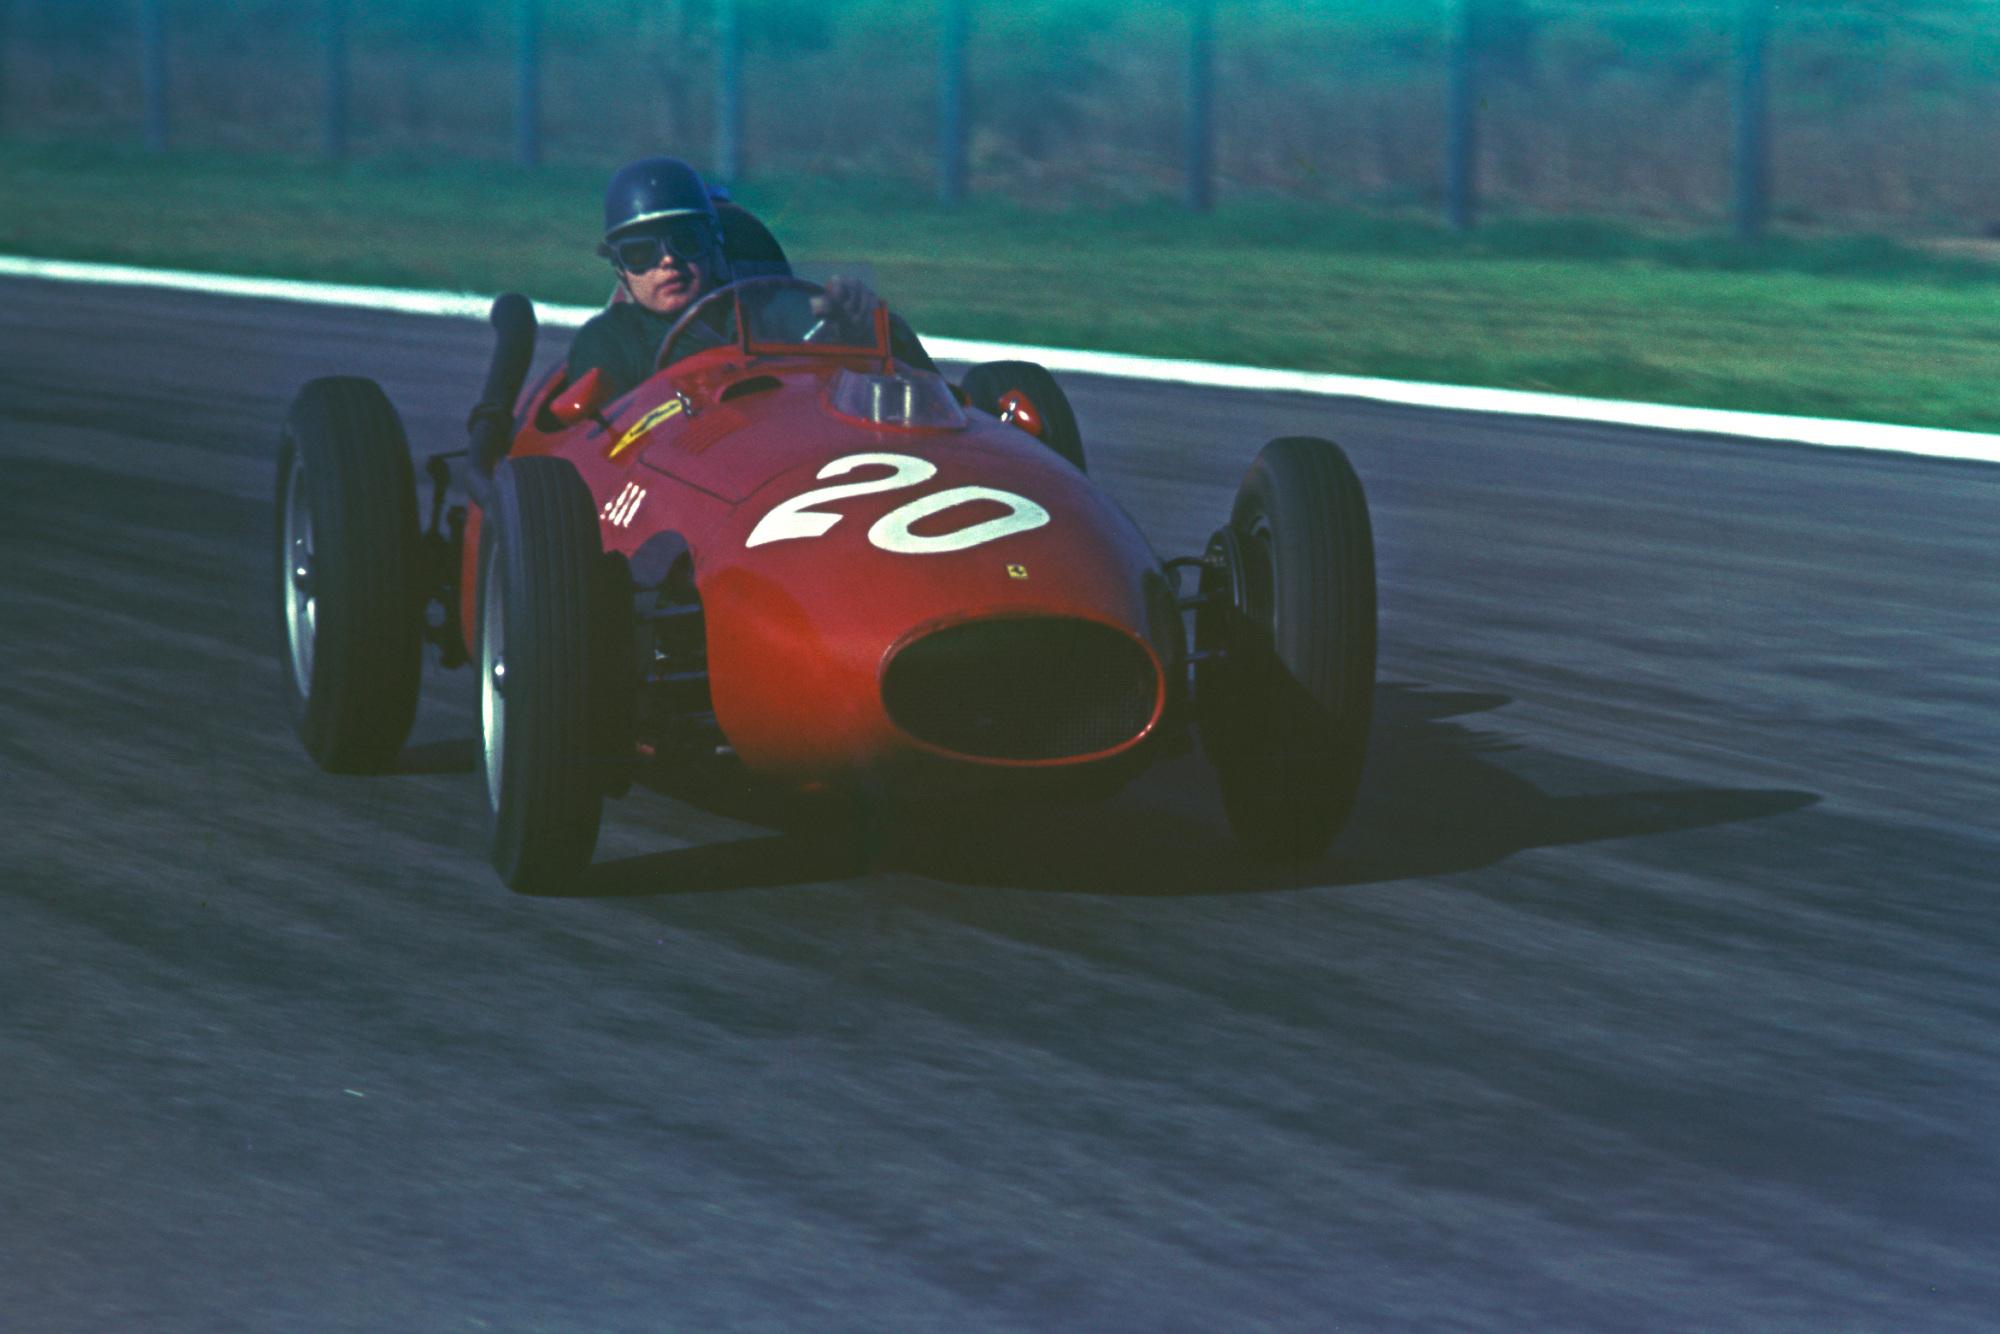 Mike Hawthorn driving his Ferrari in 1958